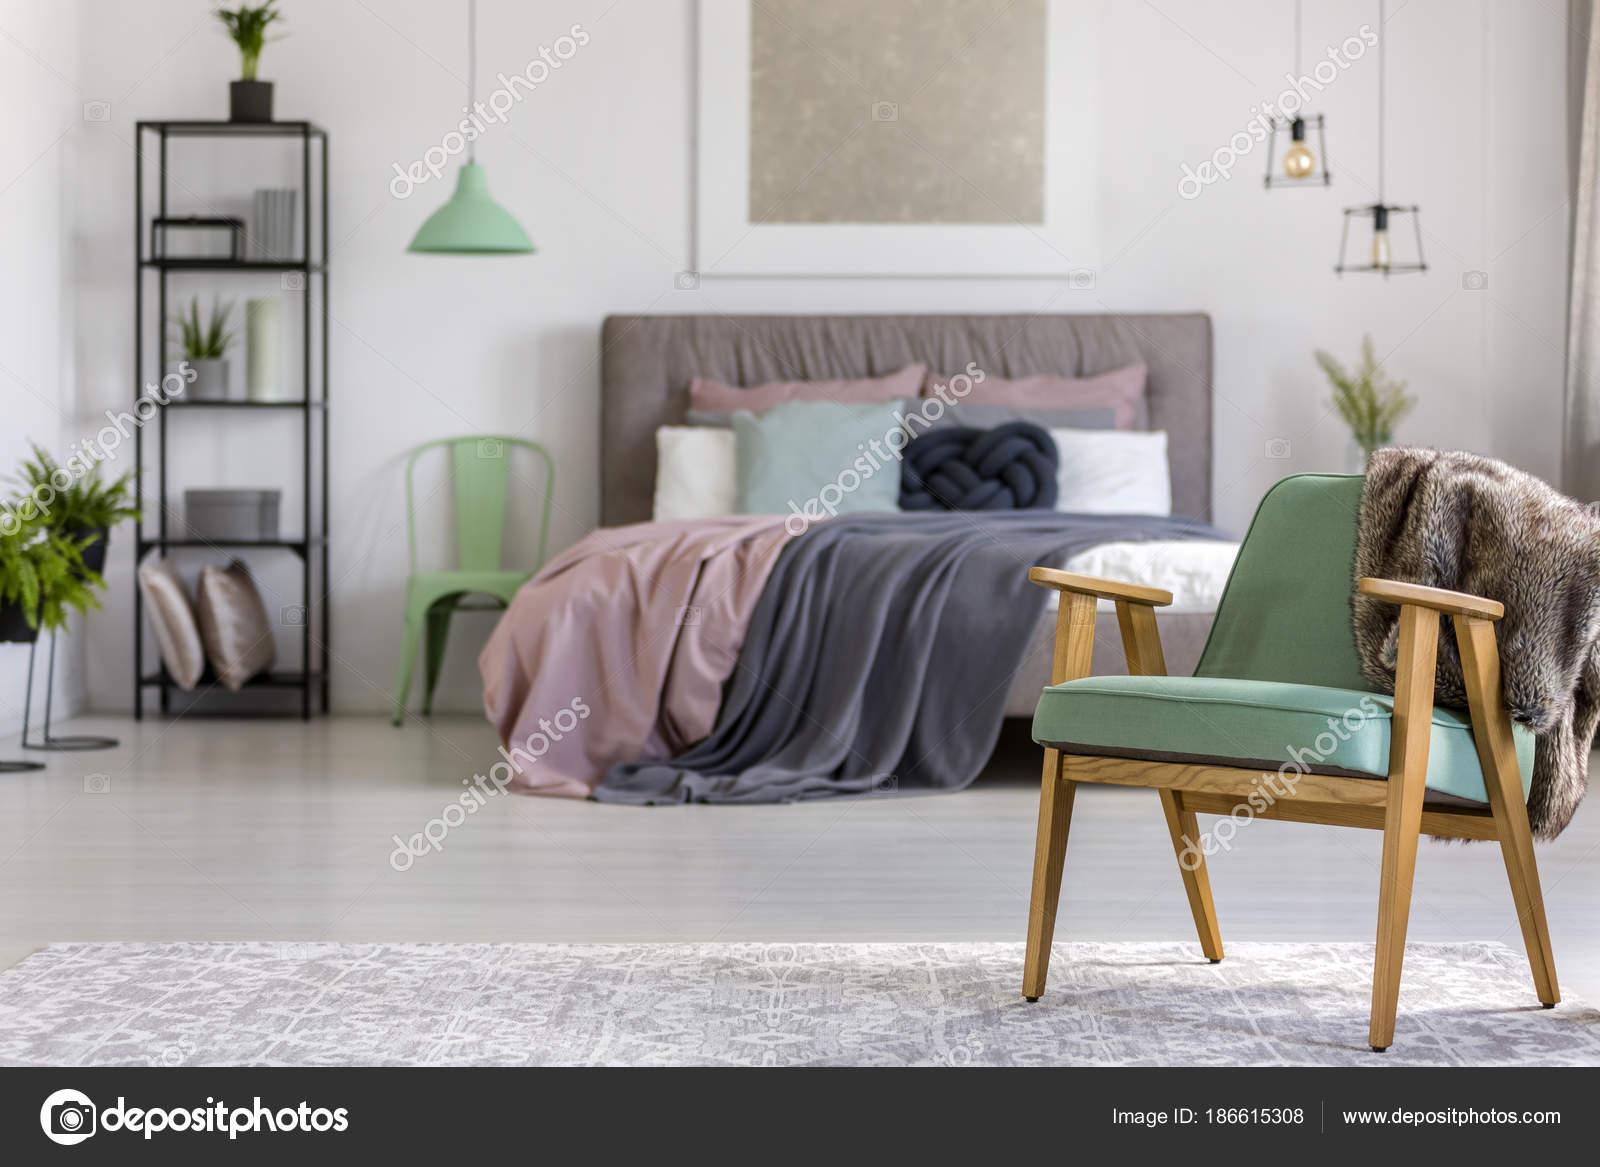 Grünes Holz Sessel im Schlafzimmer — Stockfoto ...